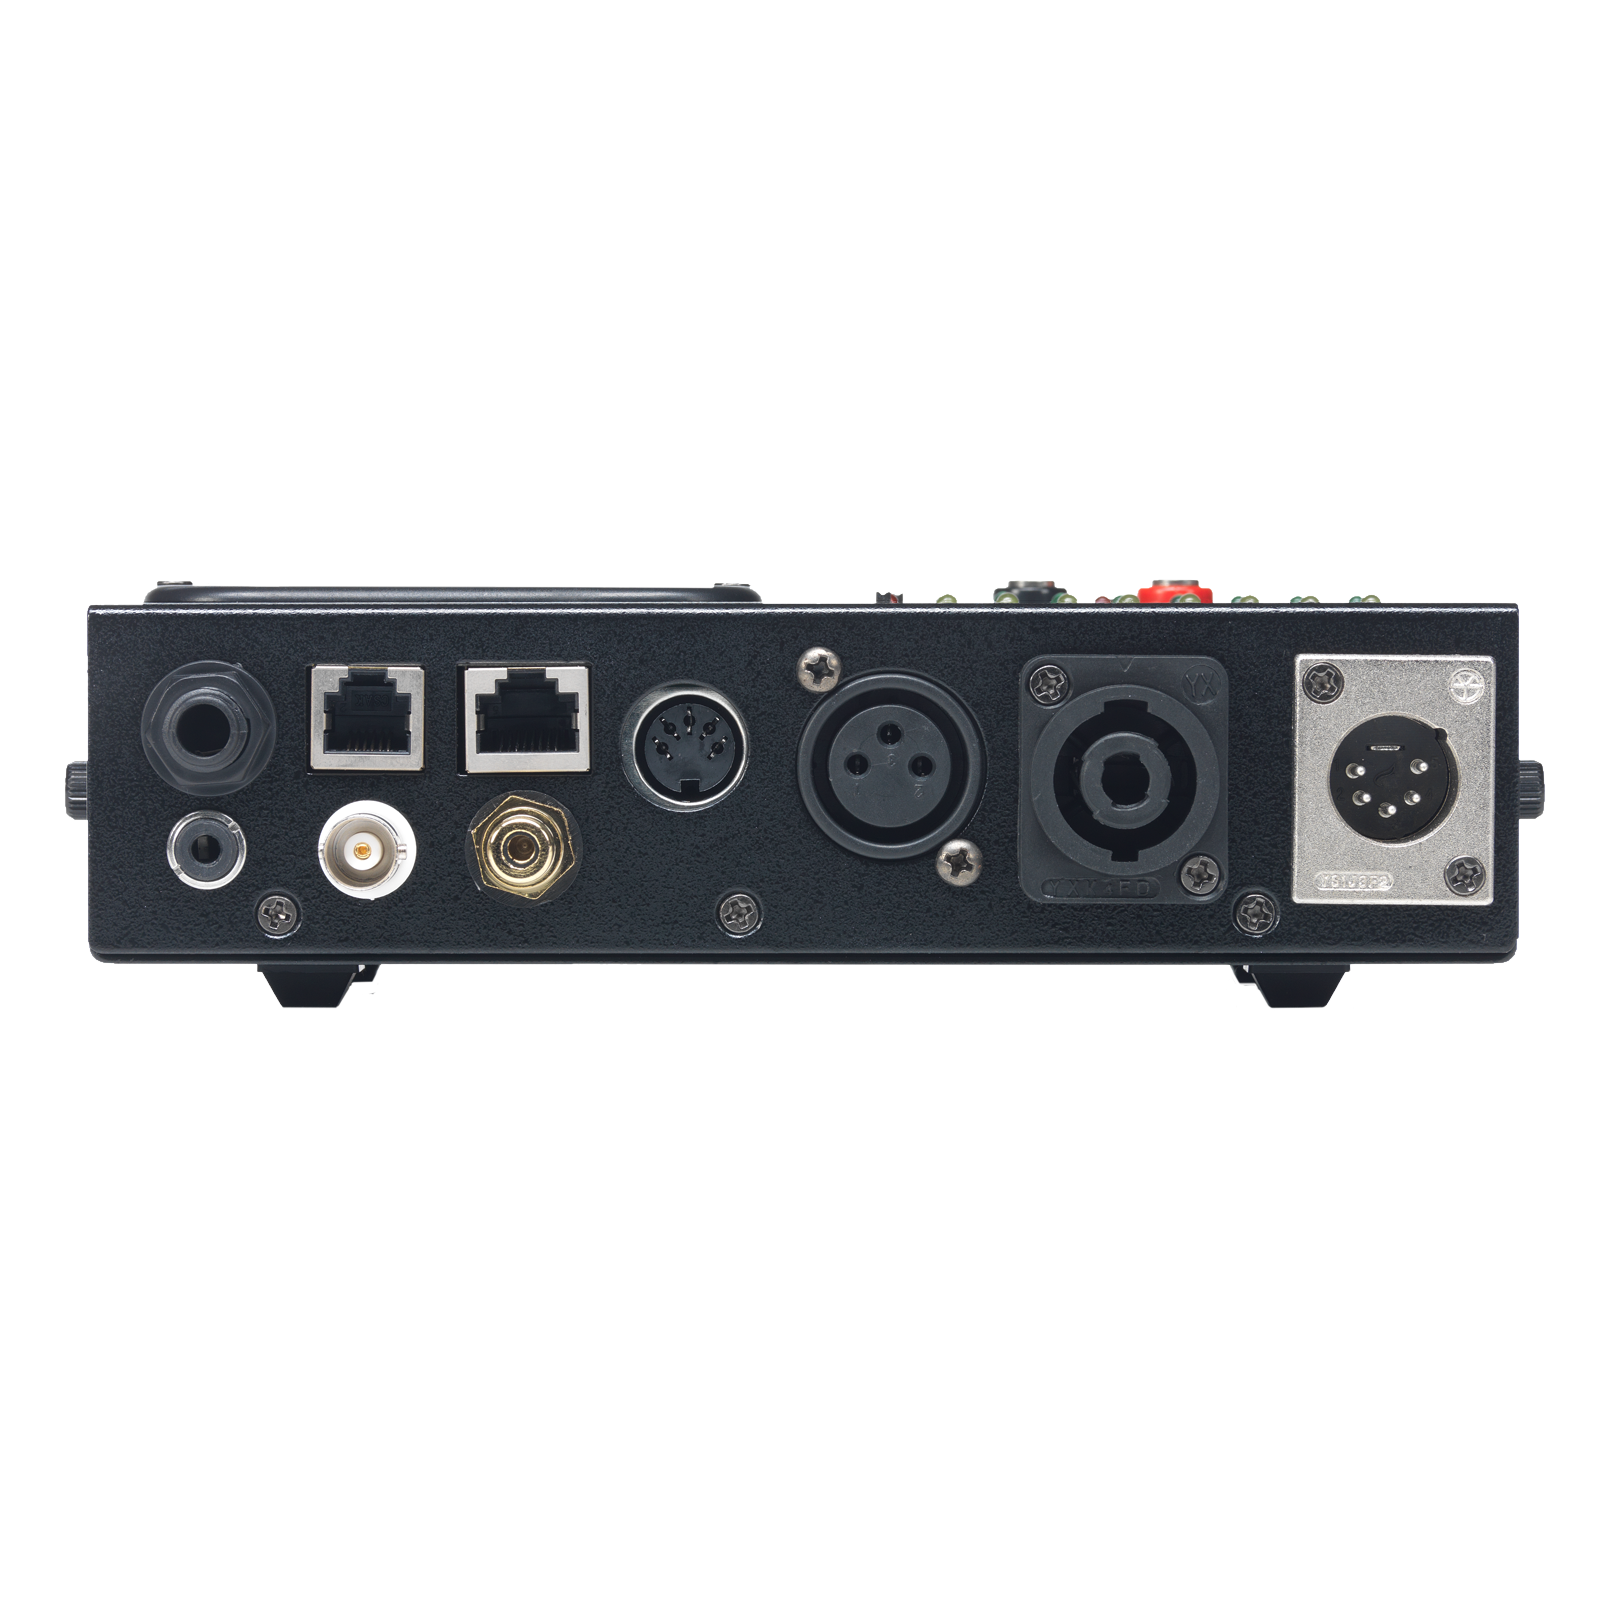 CT3 - Black - Advanced Cable Tester - Detailshot 1